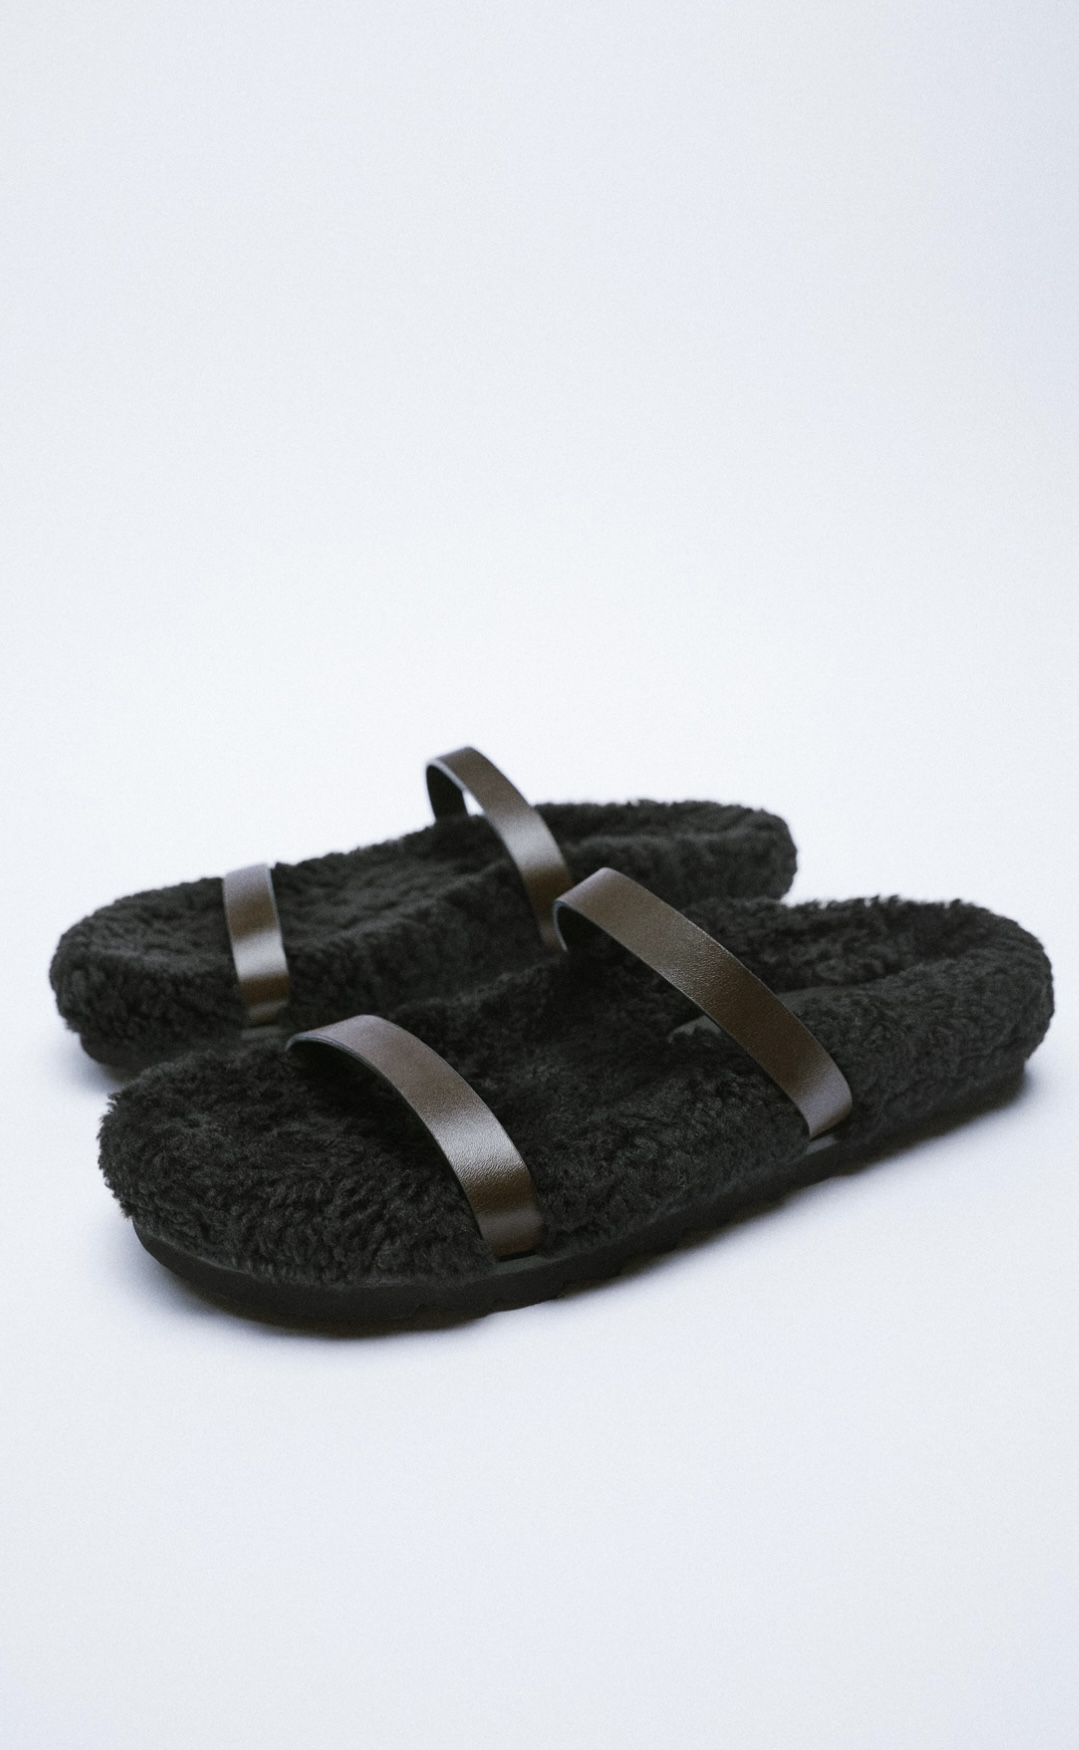 Zara, 2 999 грн